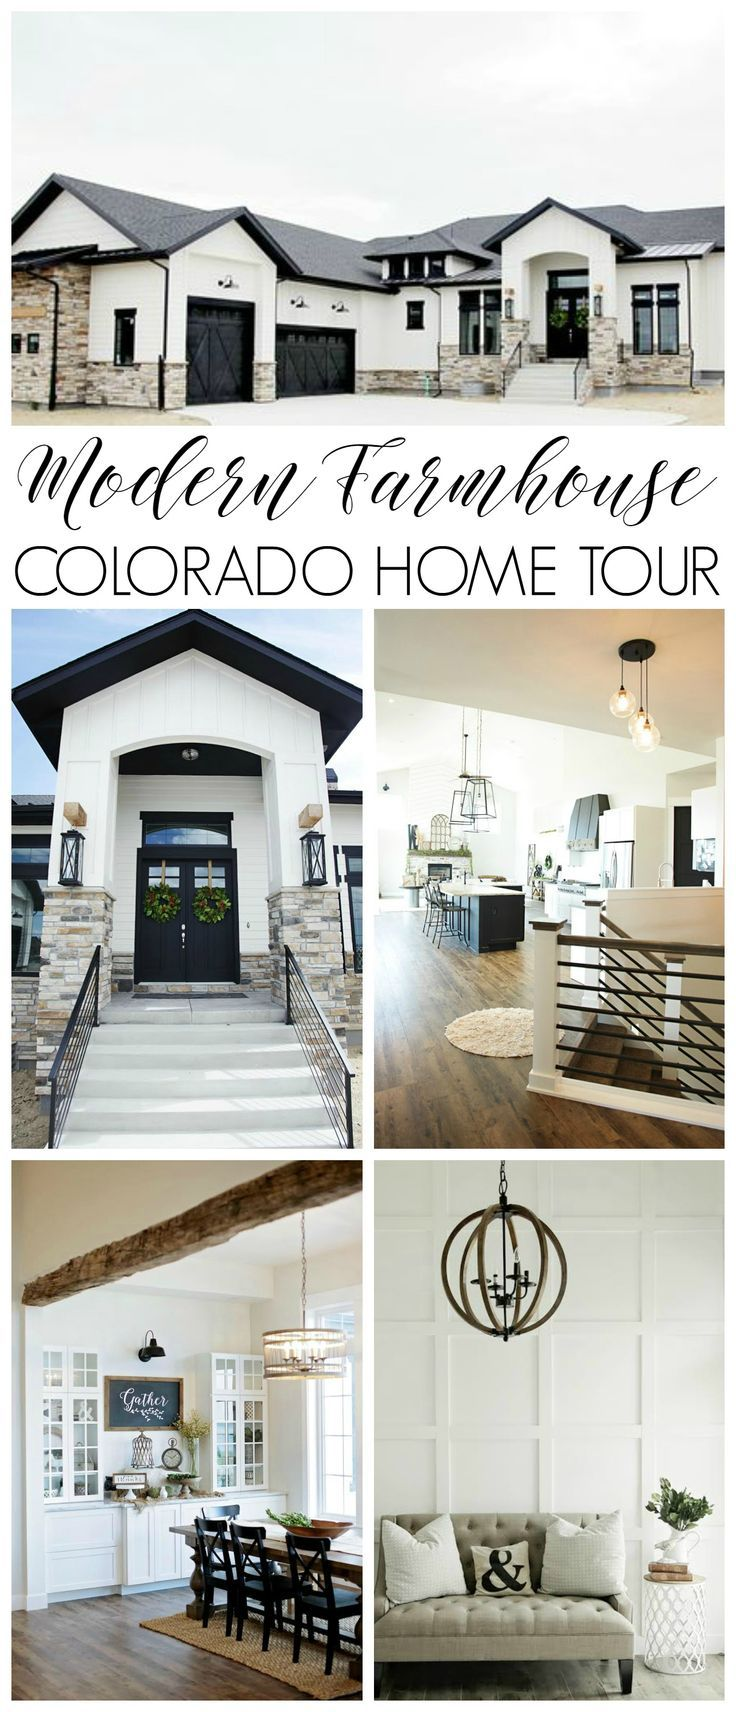 Custom Built Modern Farmhouse Home Tour With Household No 6